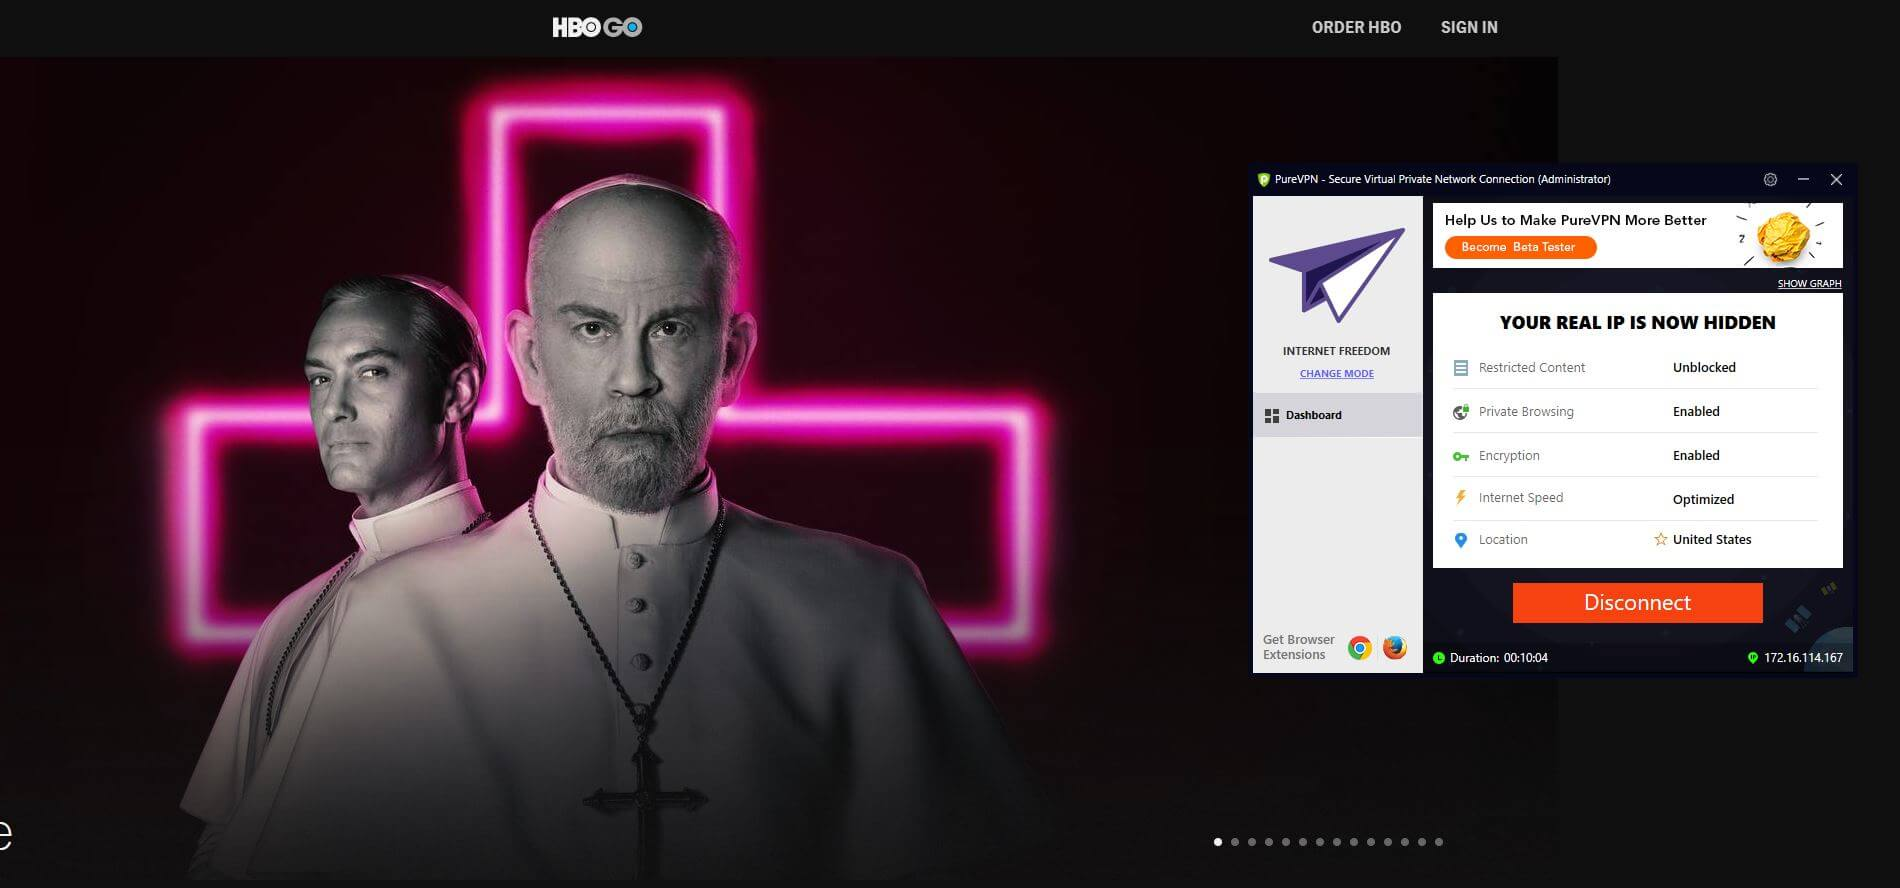 PureVPN HBO GO